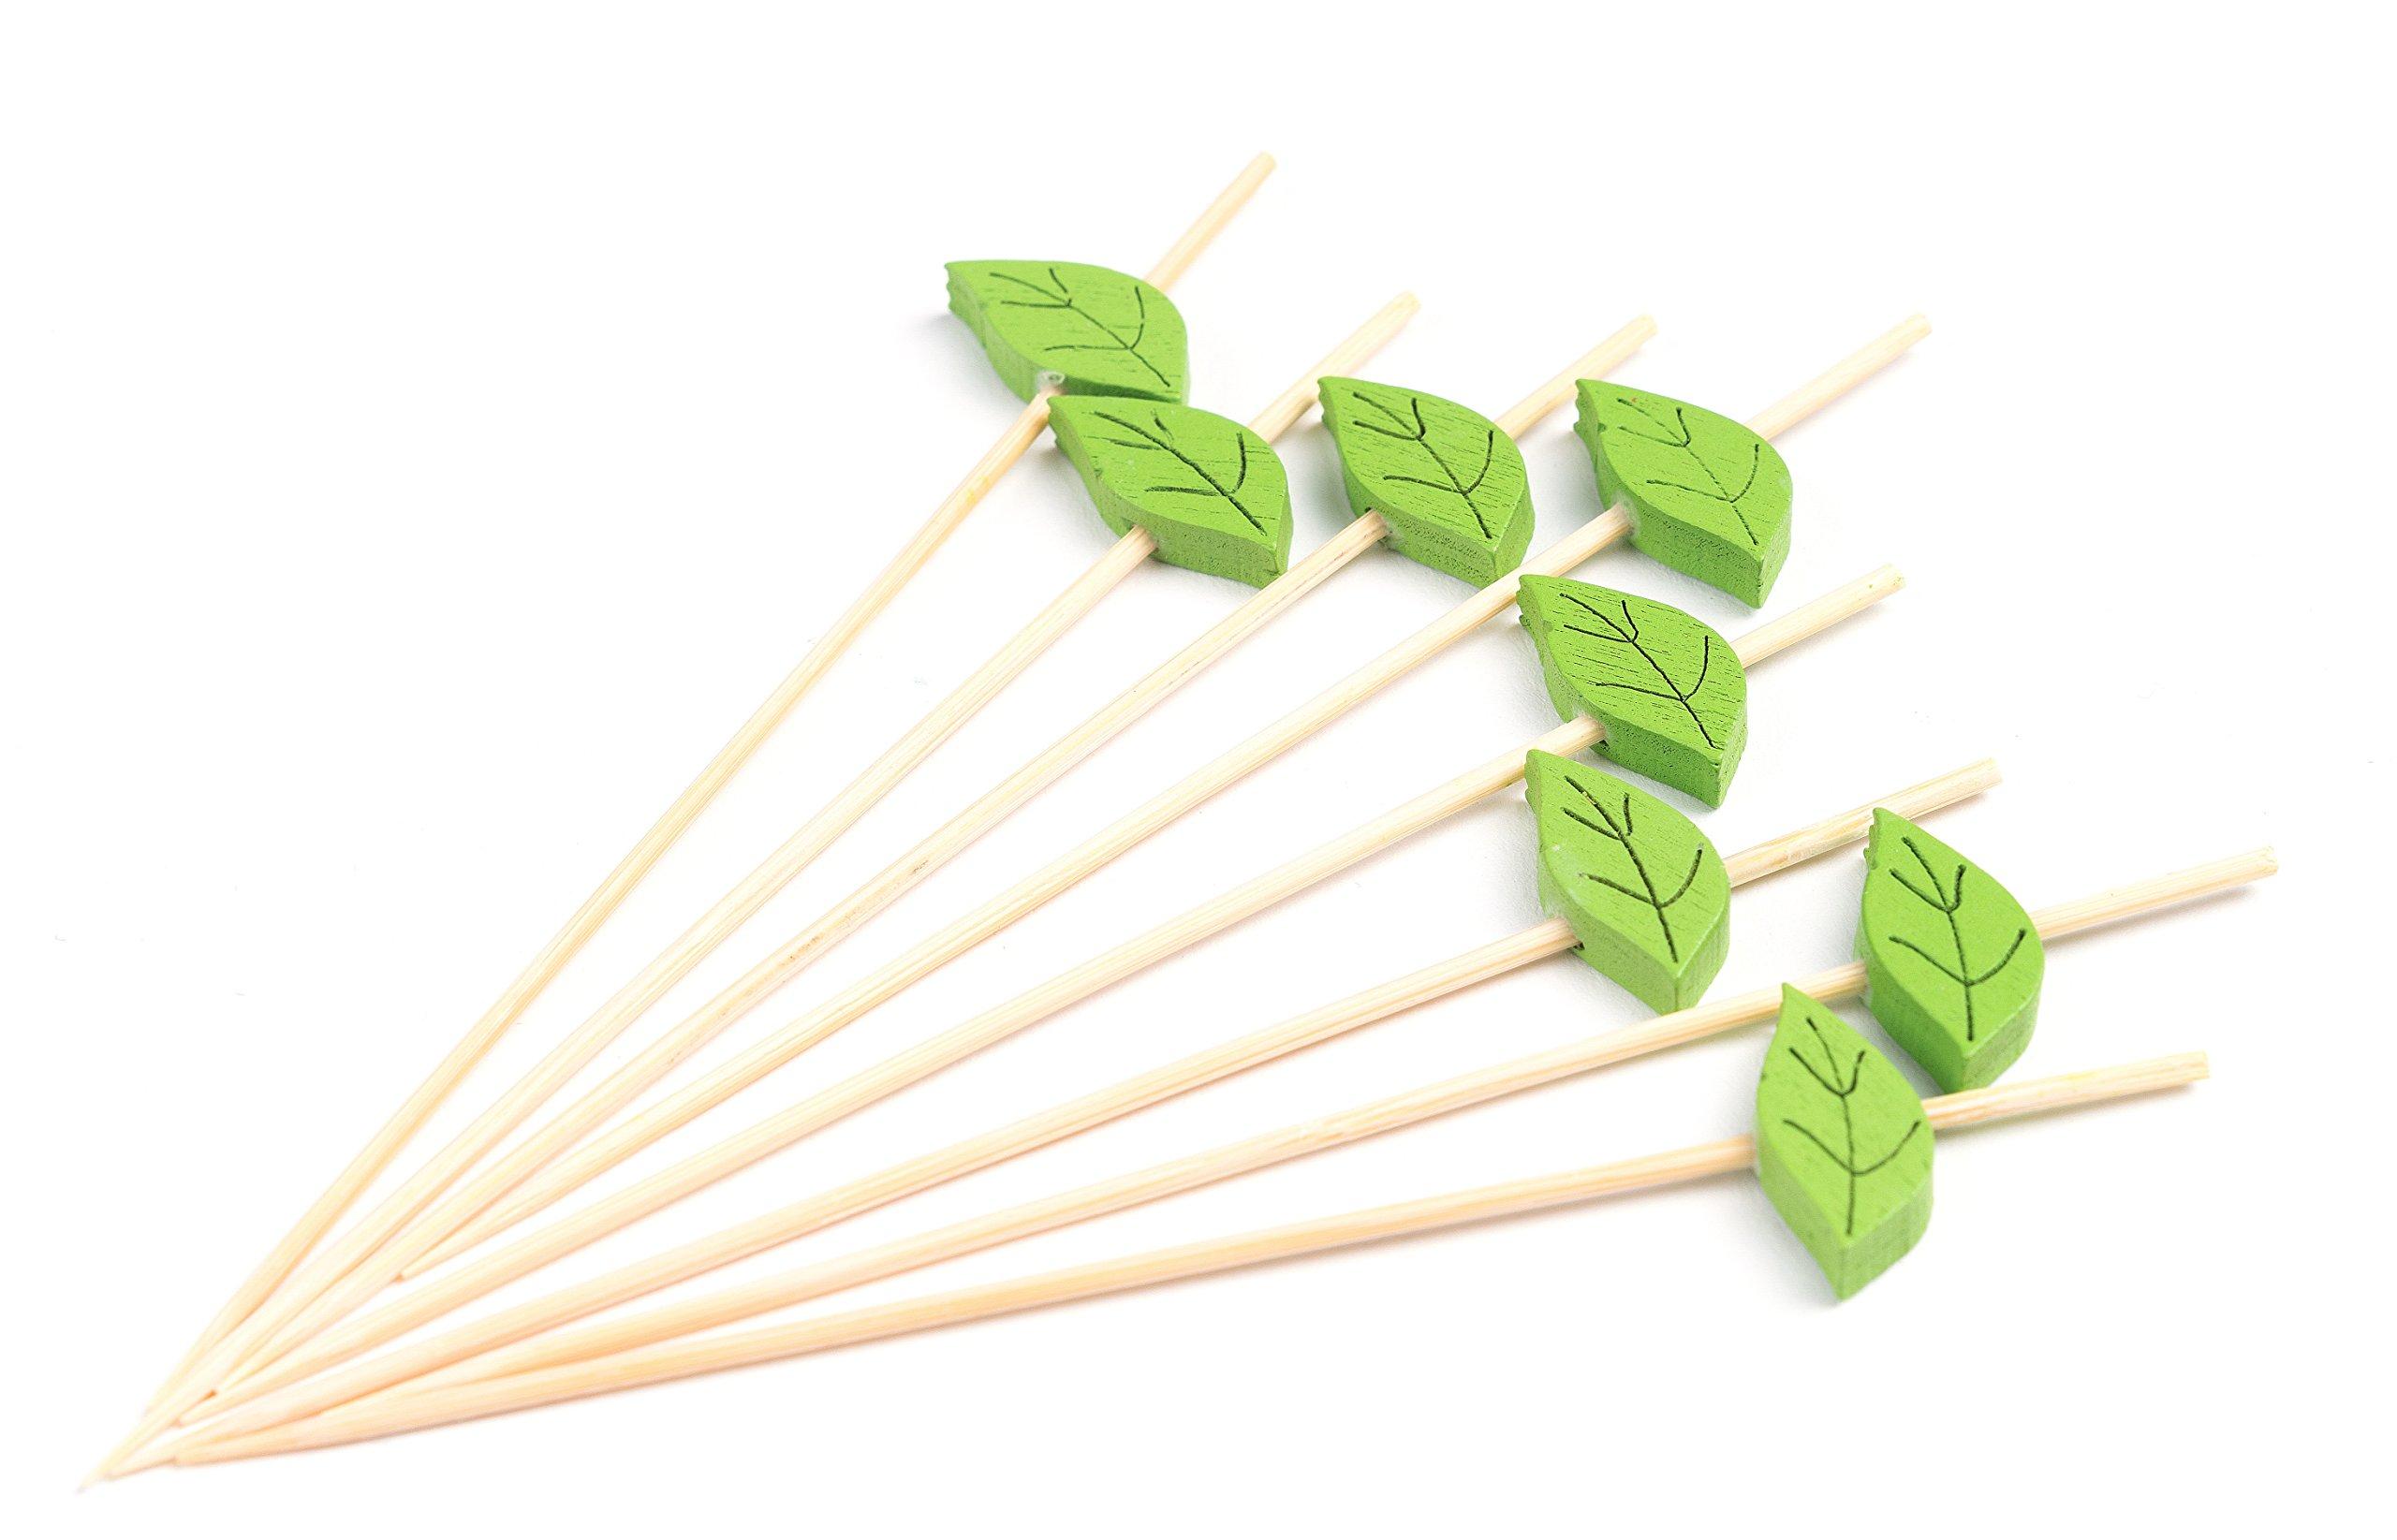 "PuTwo Cocktail Picks Handmade Bamboo Toothpicks 100ct 4.7"" Green Leaves"